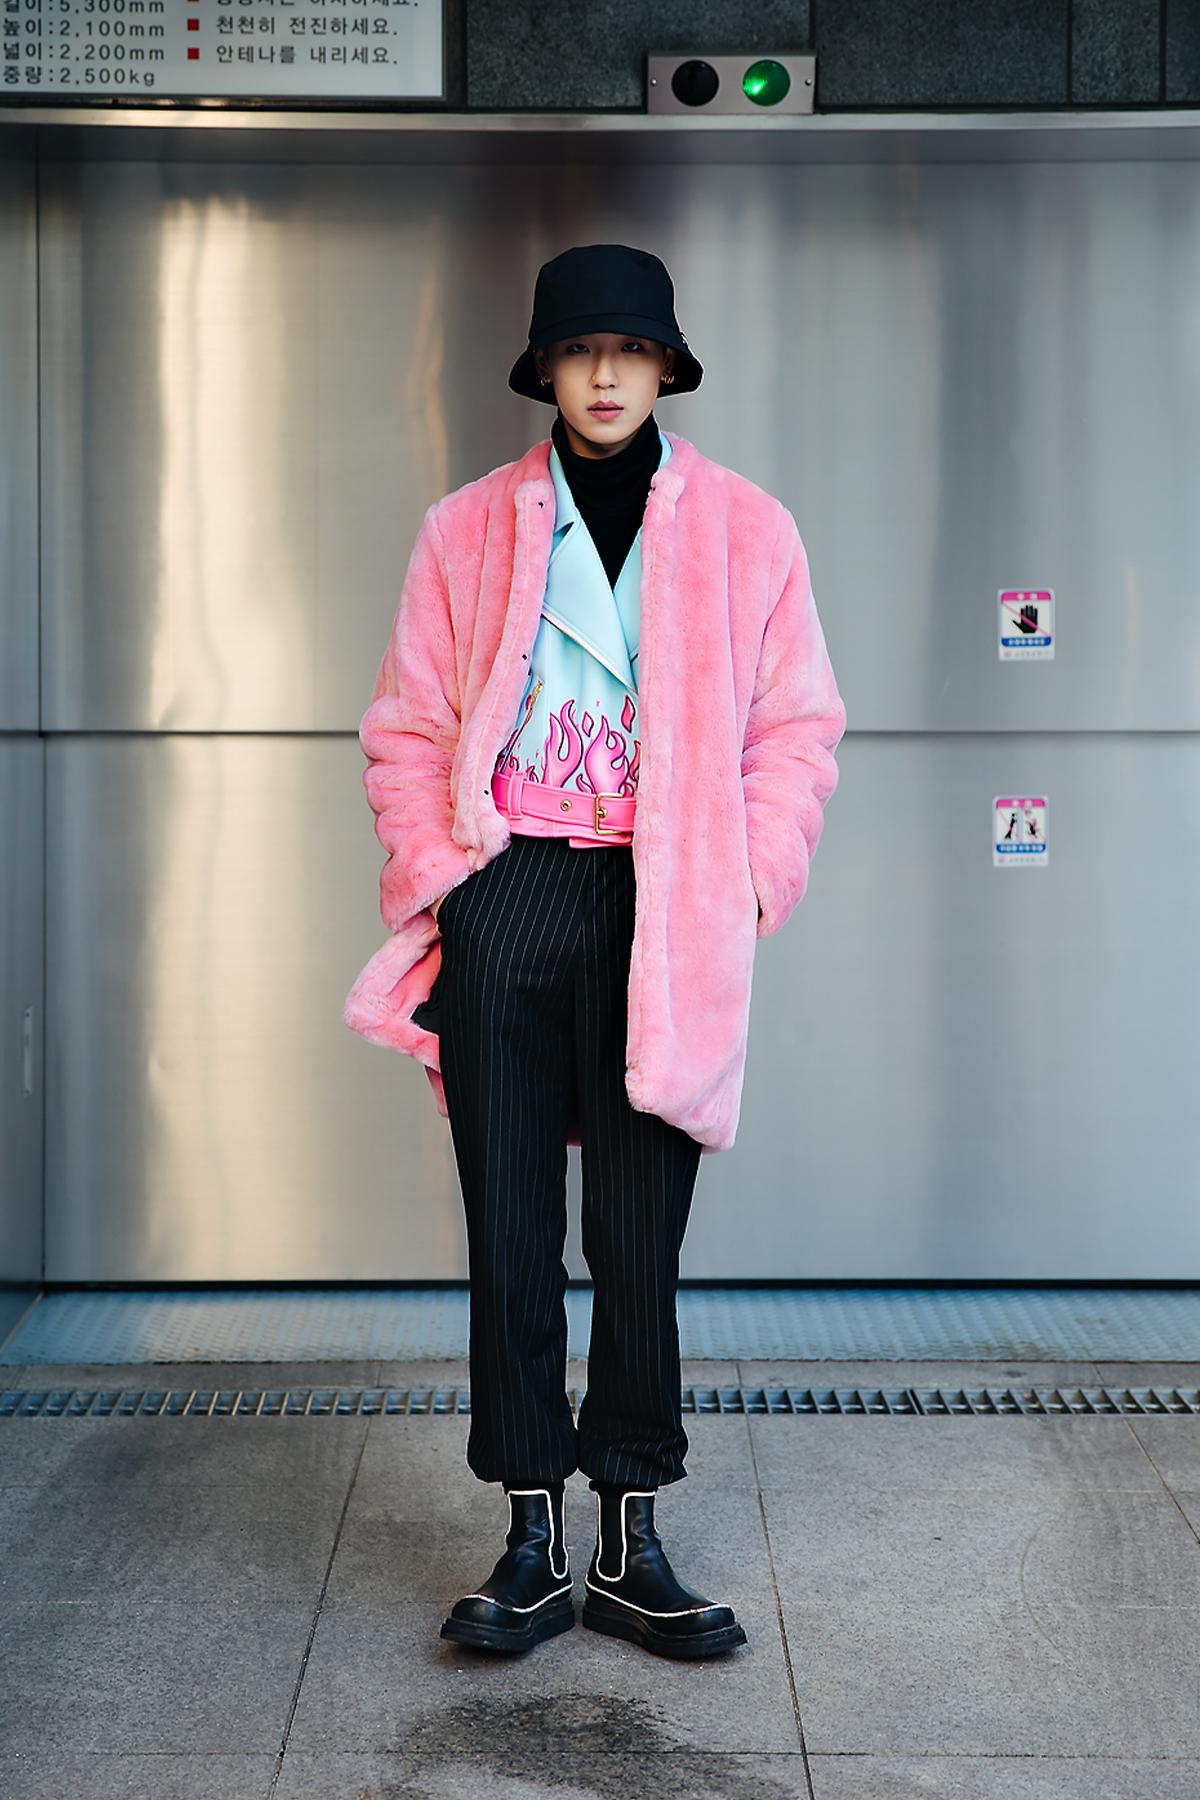 Eum Hyukjin, Street style men winter 2017-2018 inseoul